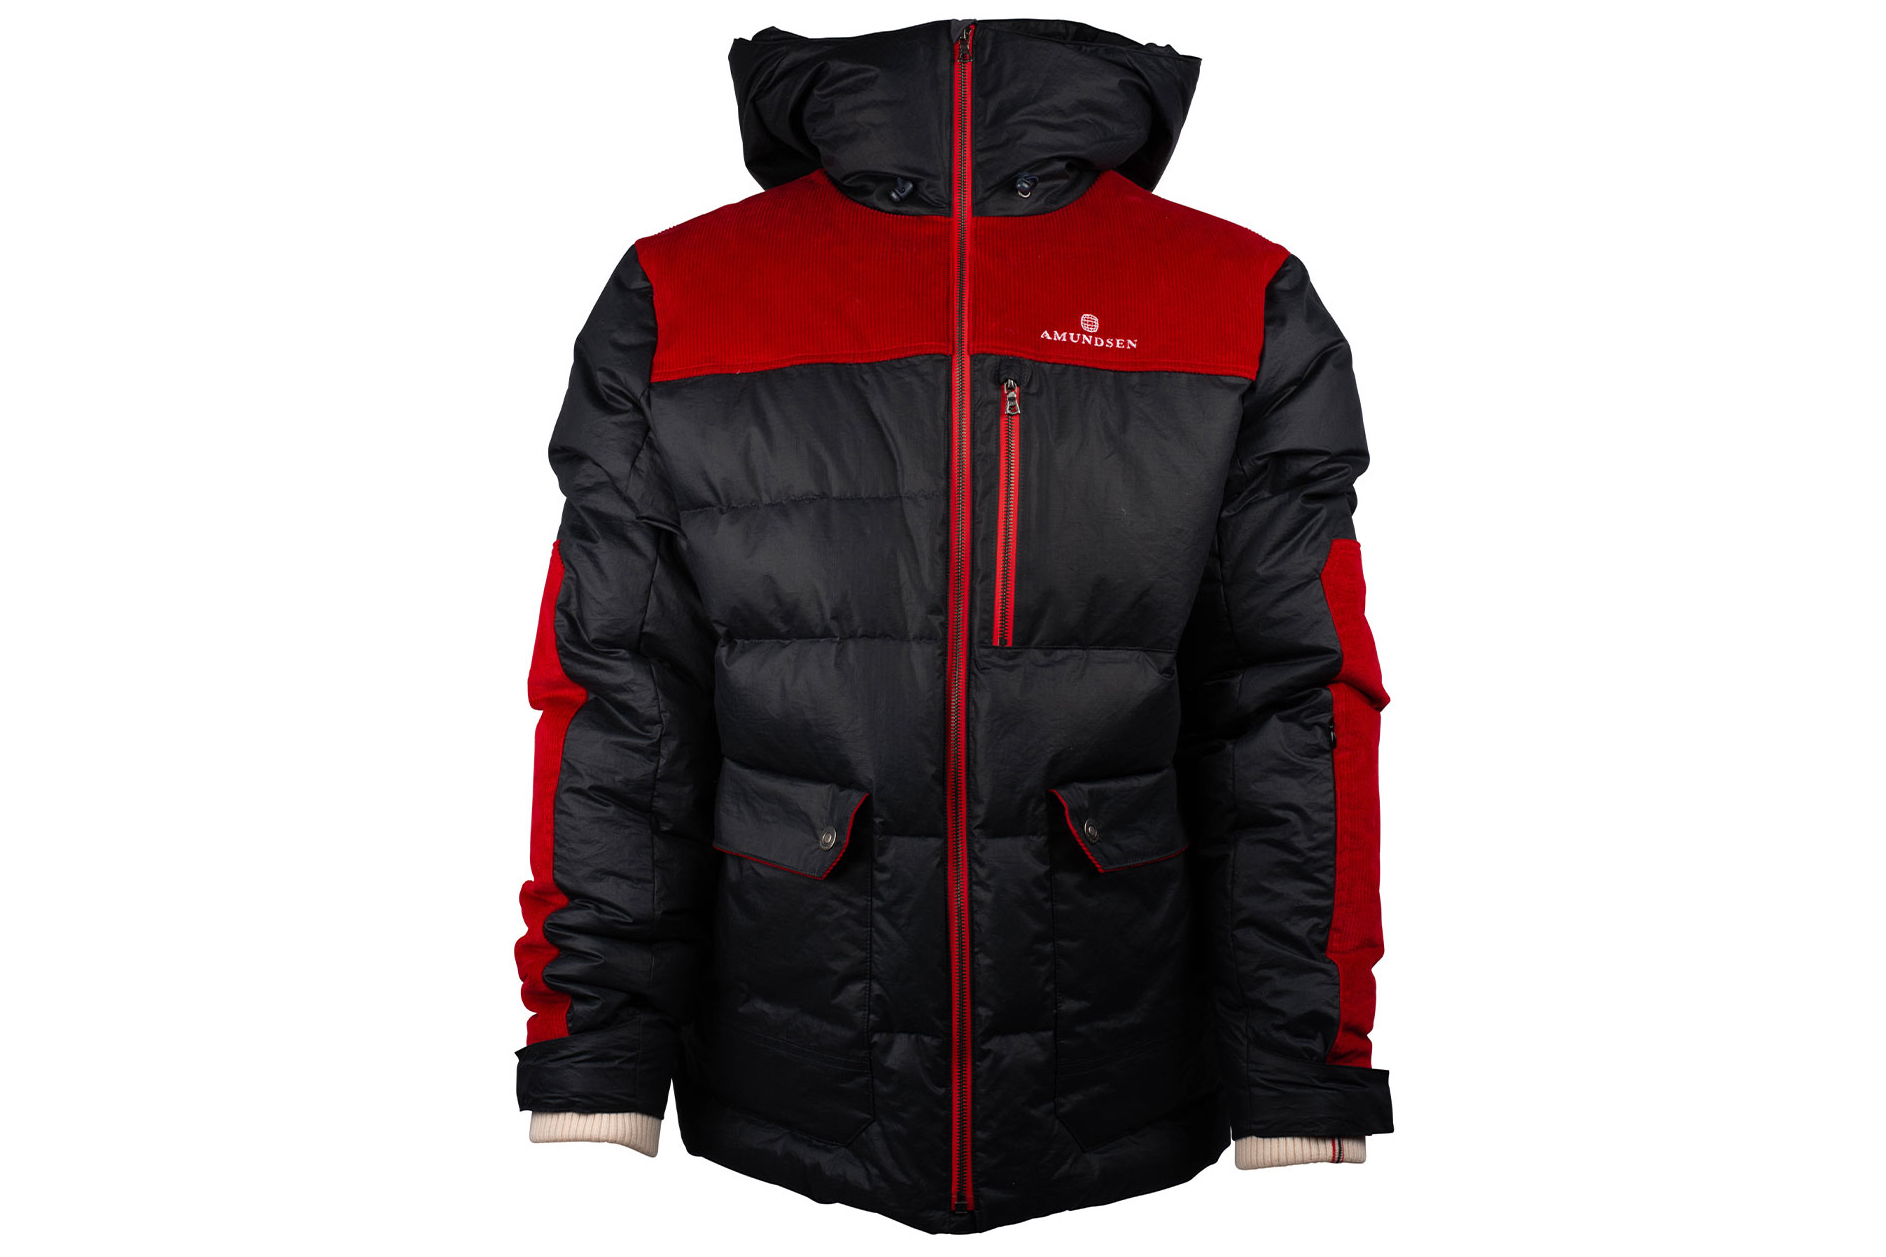 Amundsen Groomer jacket